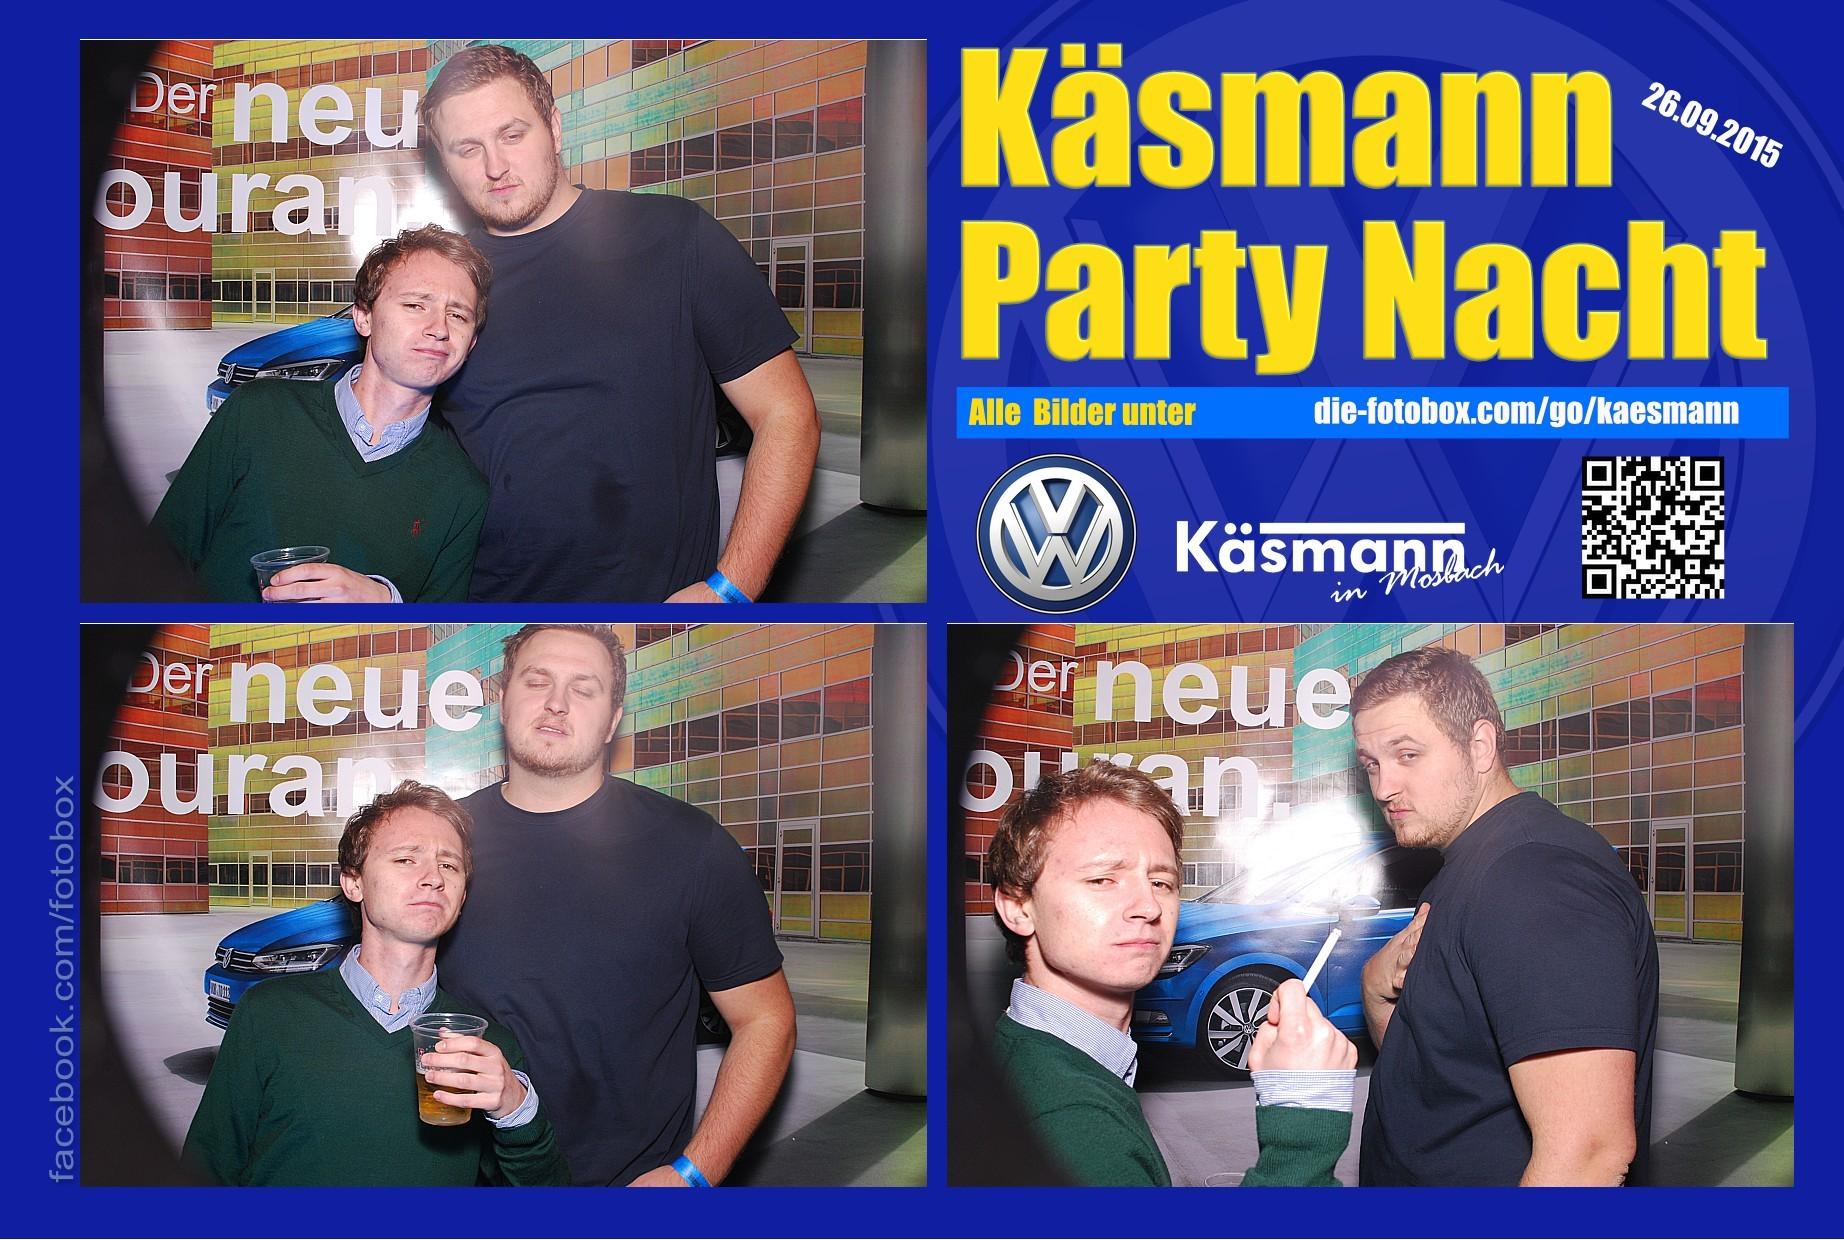 Käsmannparty 2015 - www.die-fotobox.com 01140